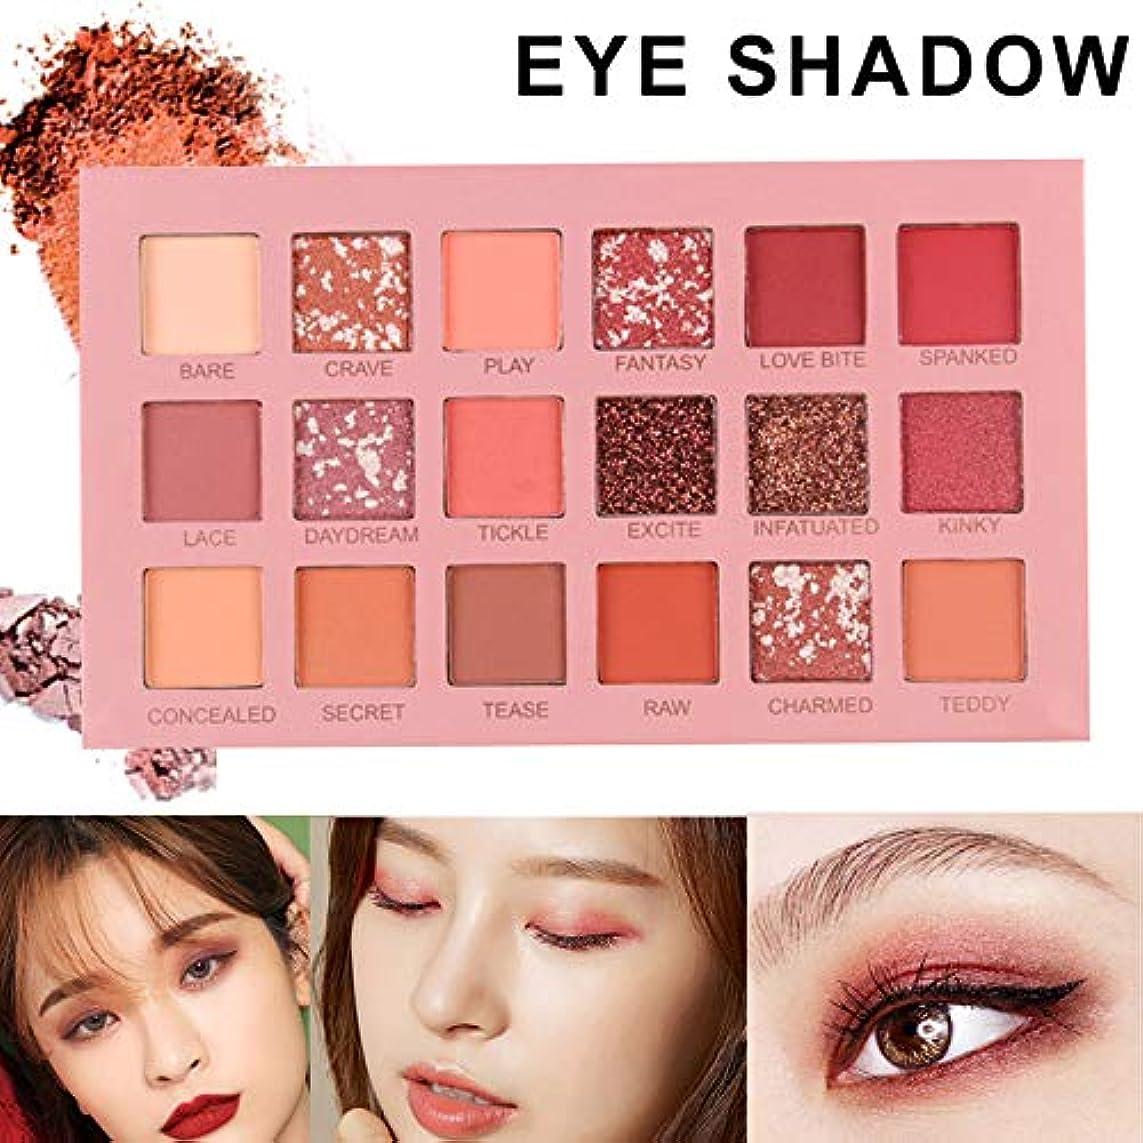 hownnery 18 colors Shining Matte Eyeshadow Pearlescent Waterproof Smog Eye Shadow Palette